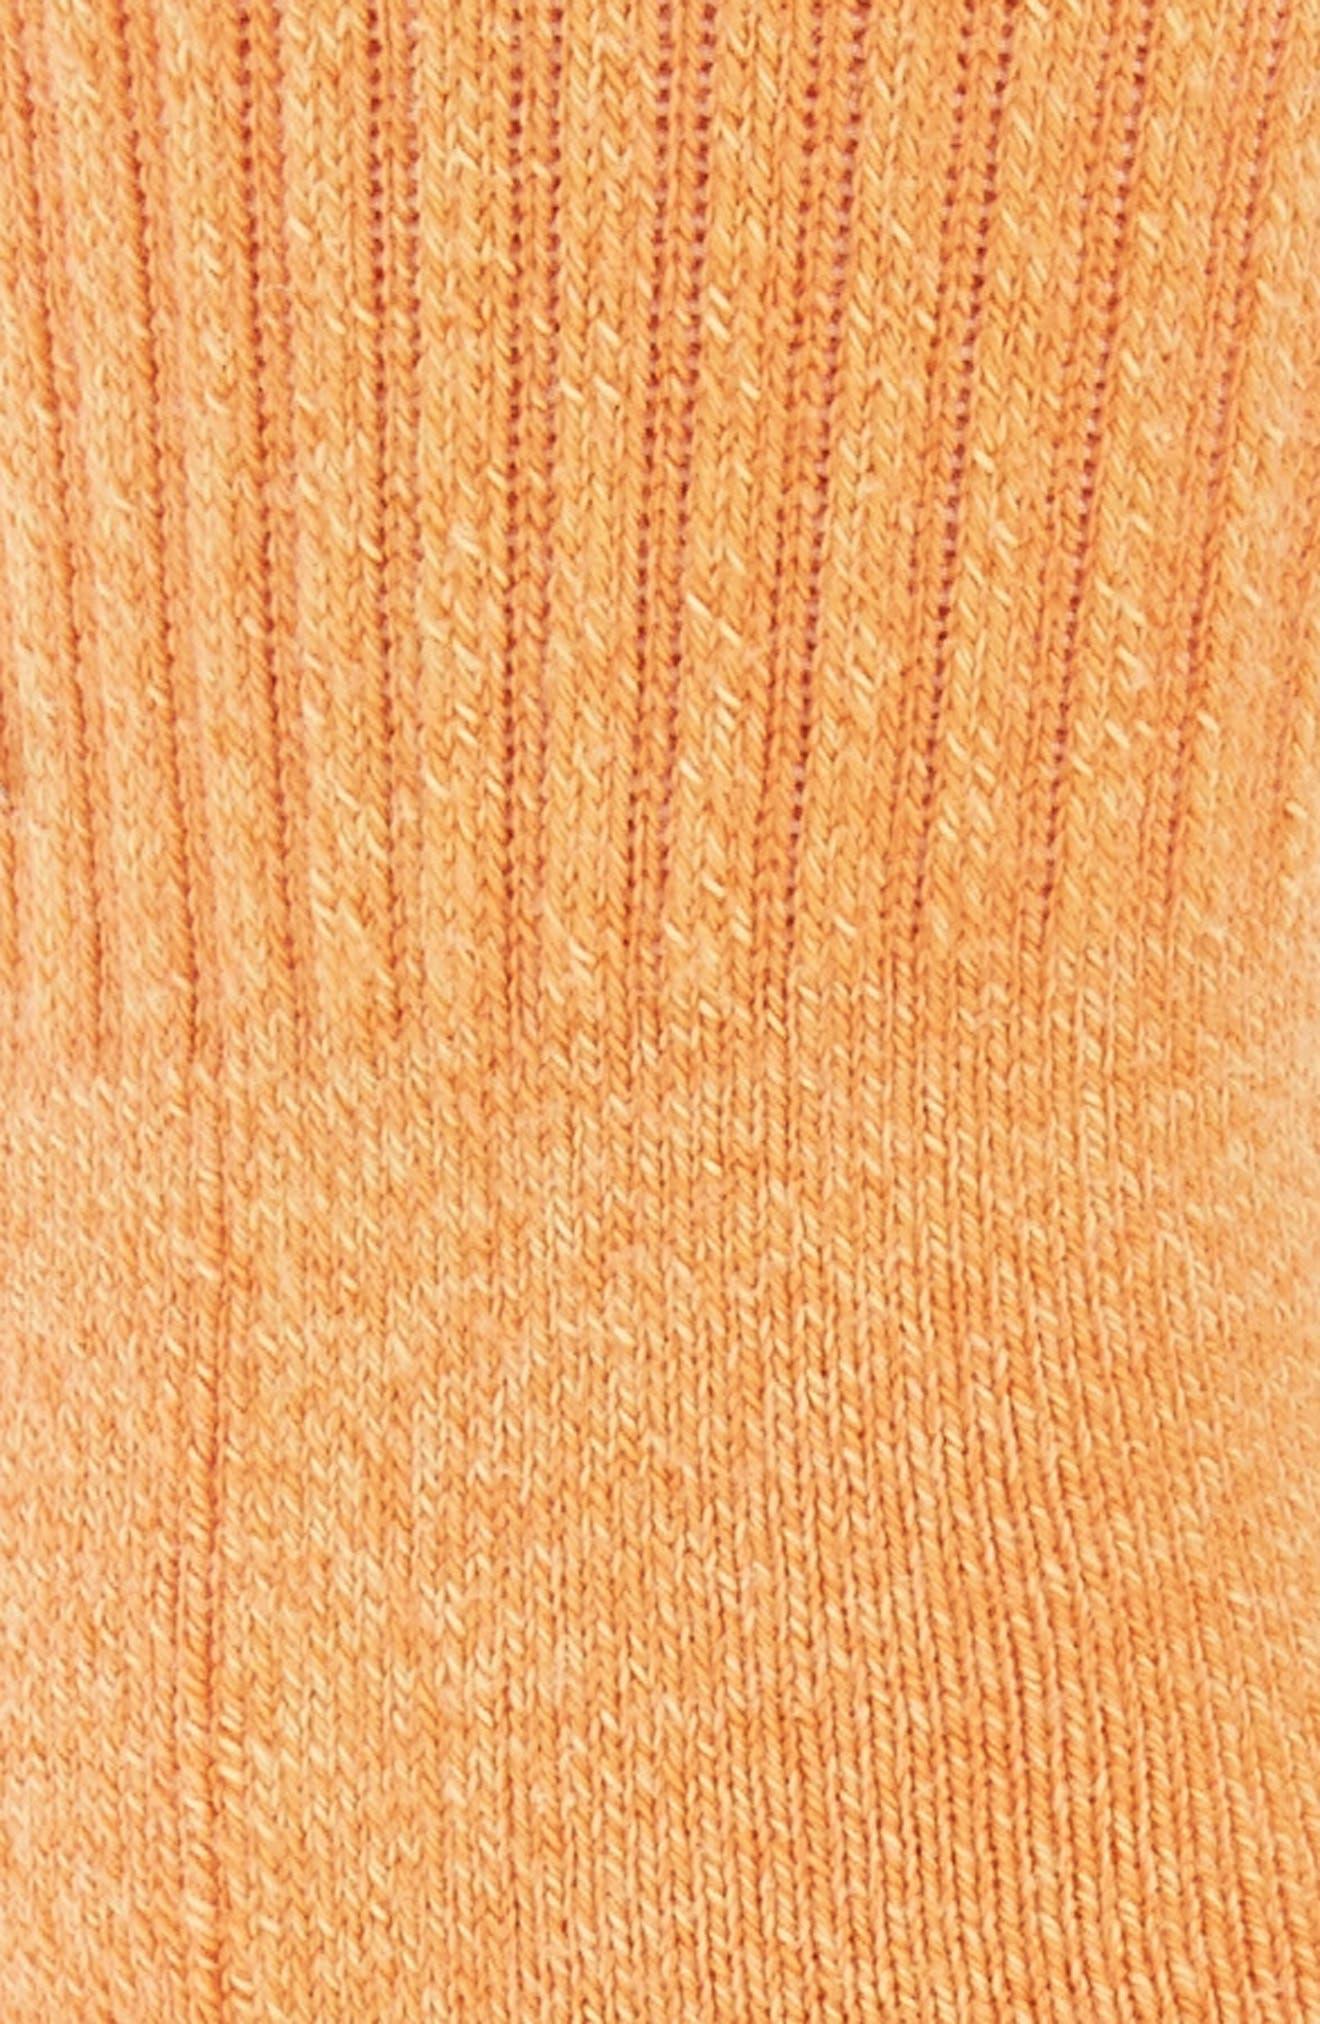 Salty Crew Socks,                             Alternate thumbnail 2, color,                             Pastel Orange